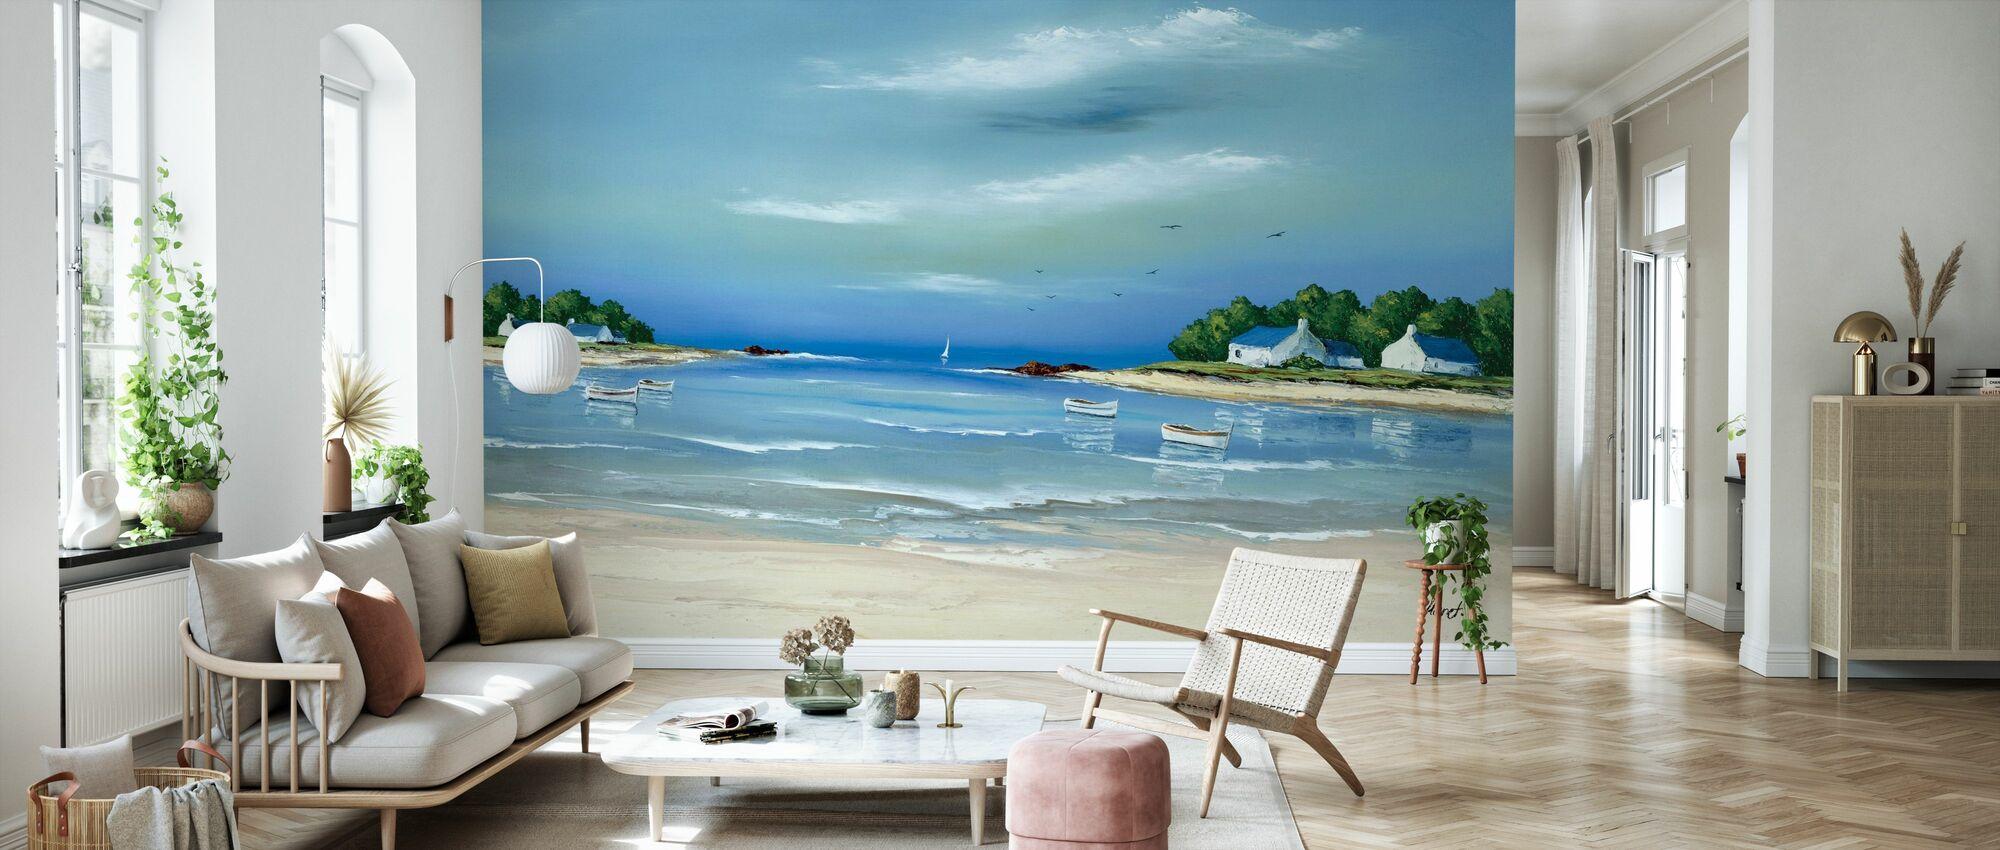 Côte Bretonne II - Wallpaper - Living Room